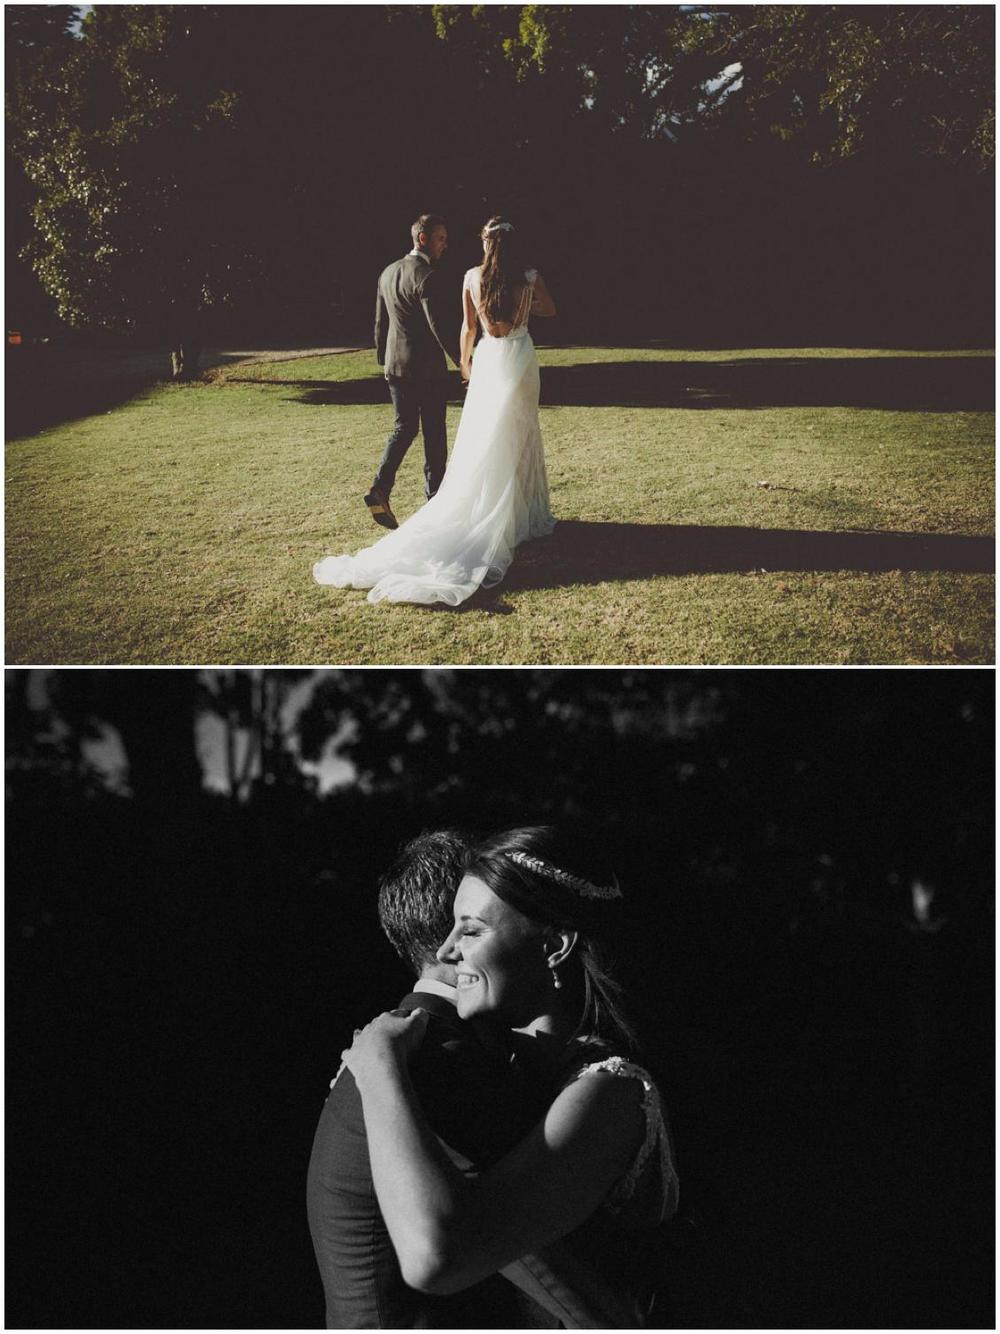 Brandon&Bianca_Constantia_Fionaclairphotography-193.jpg